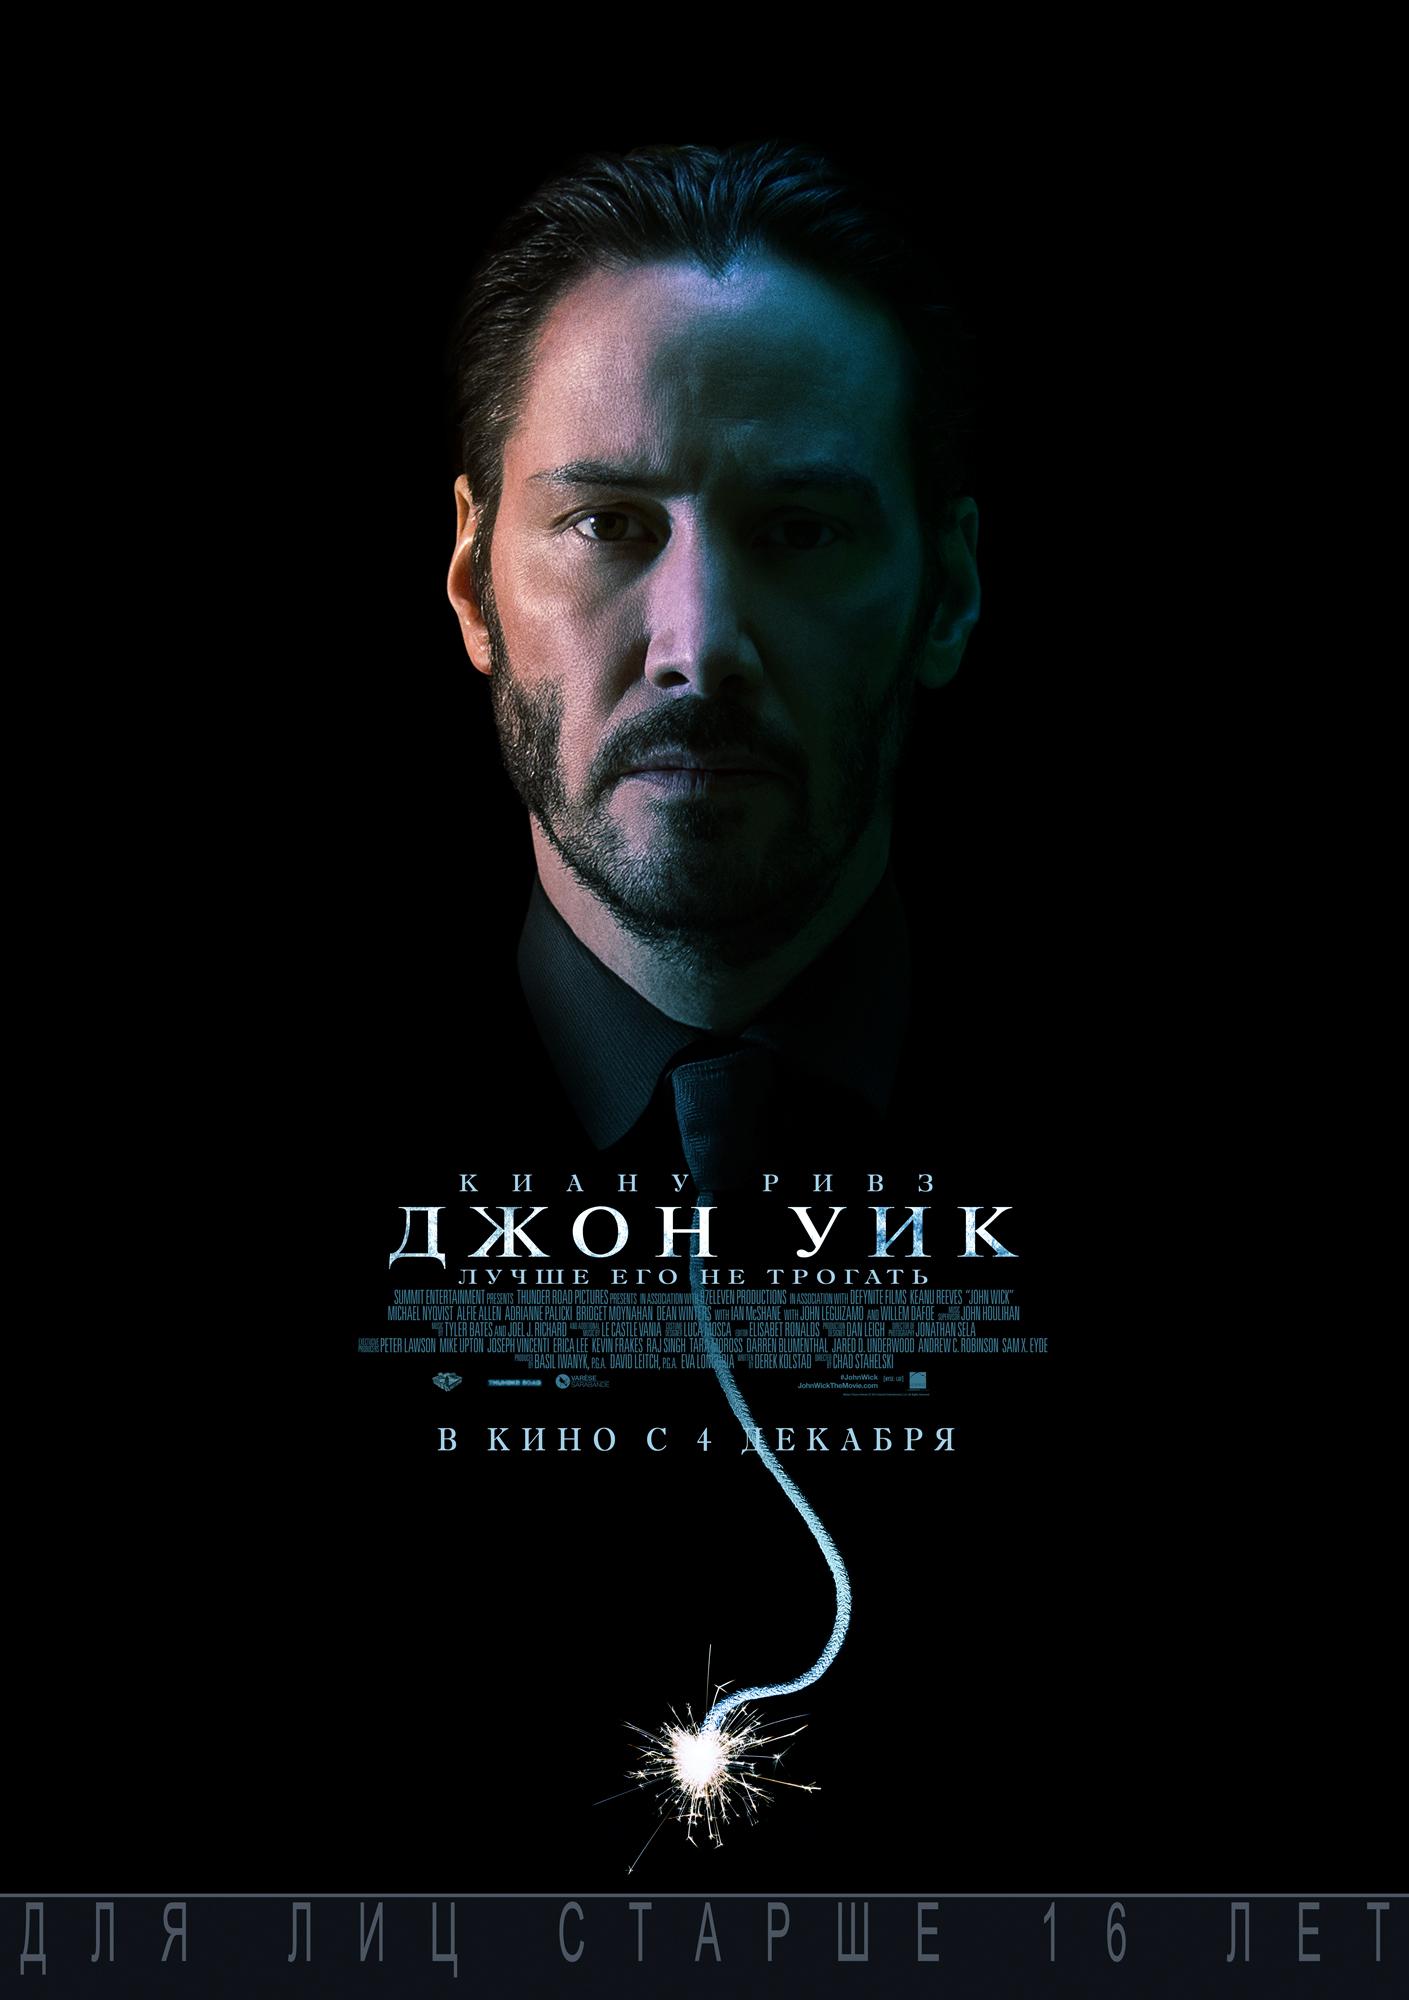 John Wick Full Movie Subtitle Indonesia - ticklesouls.over